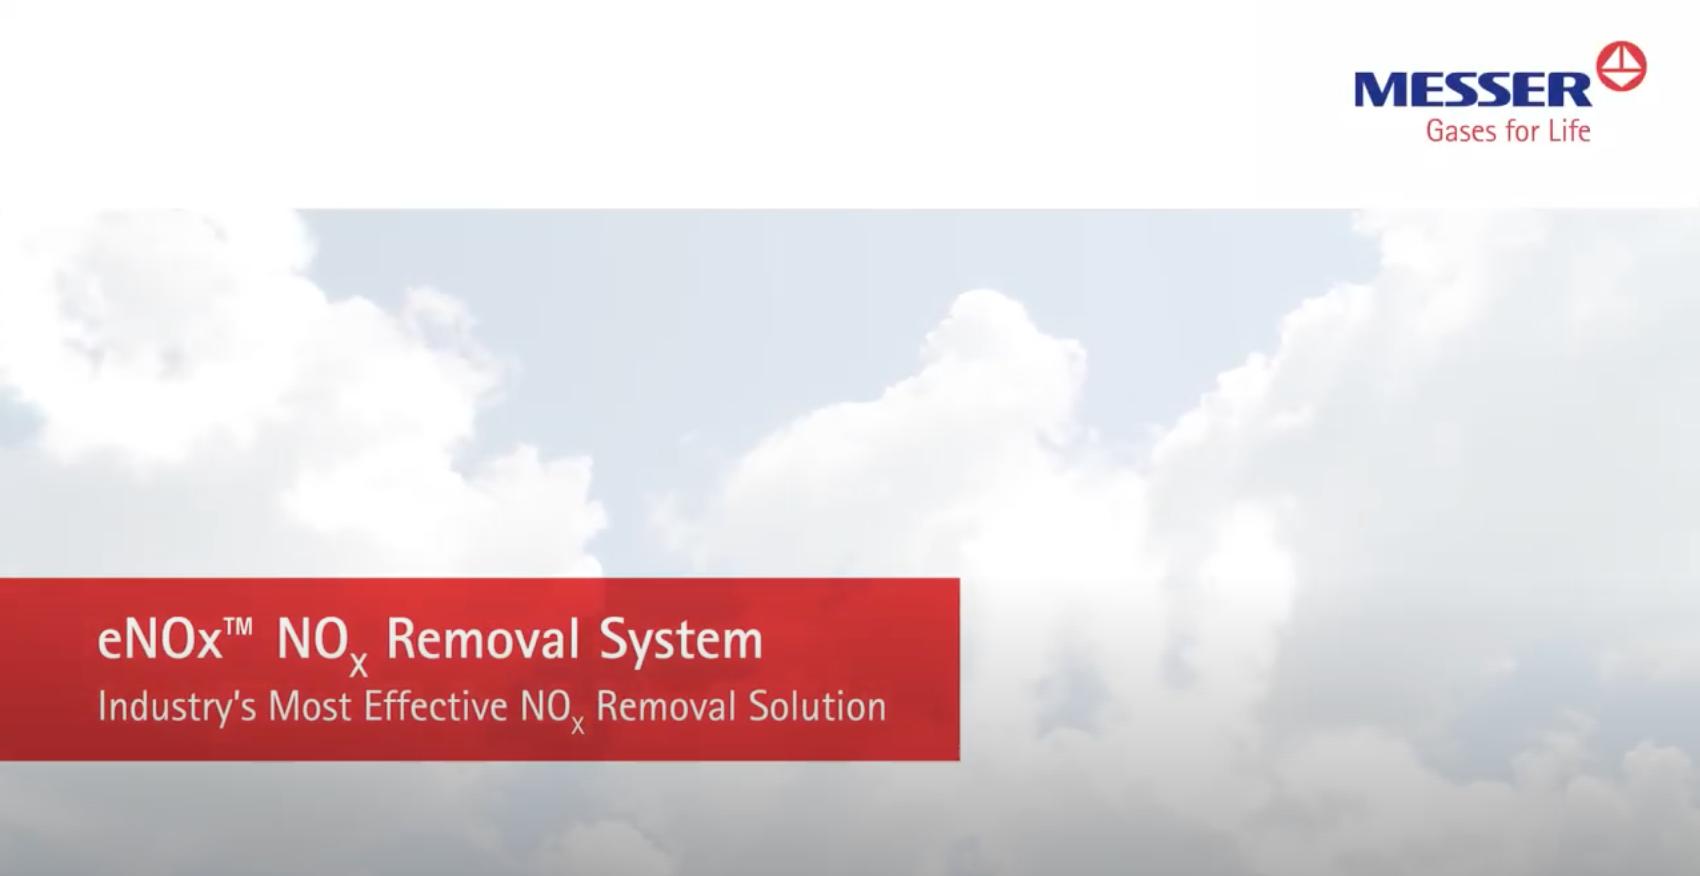 Messer eNOx NOx Removal System